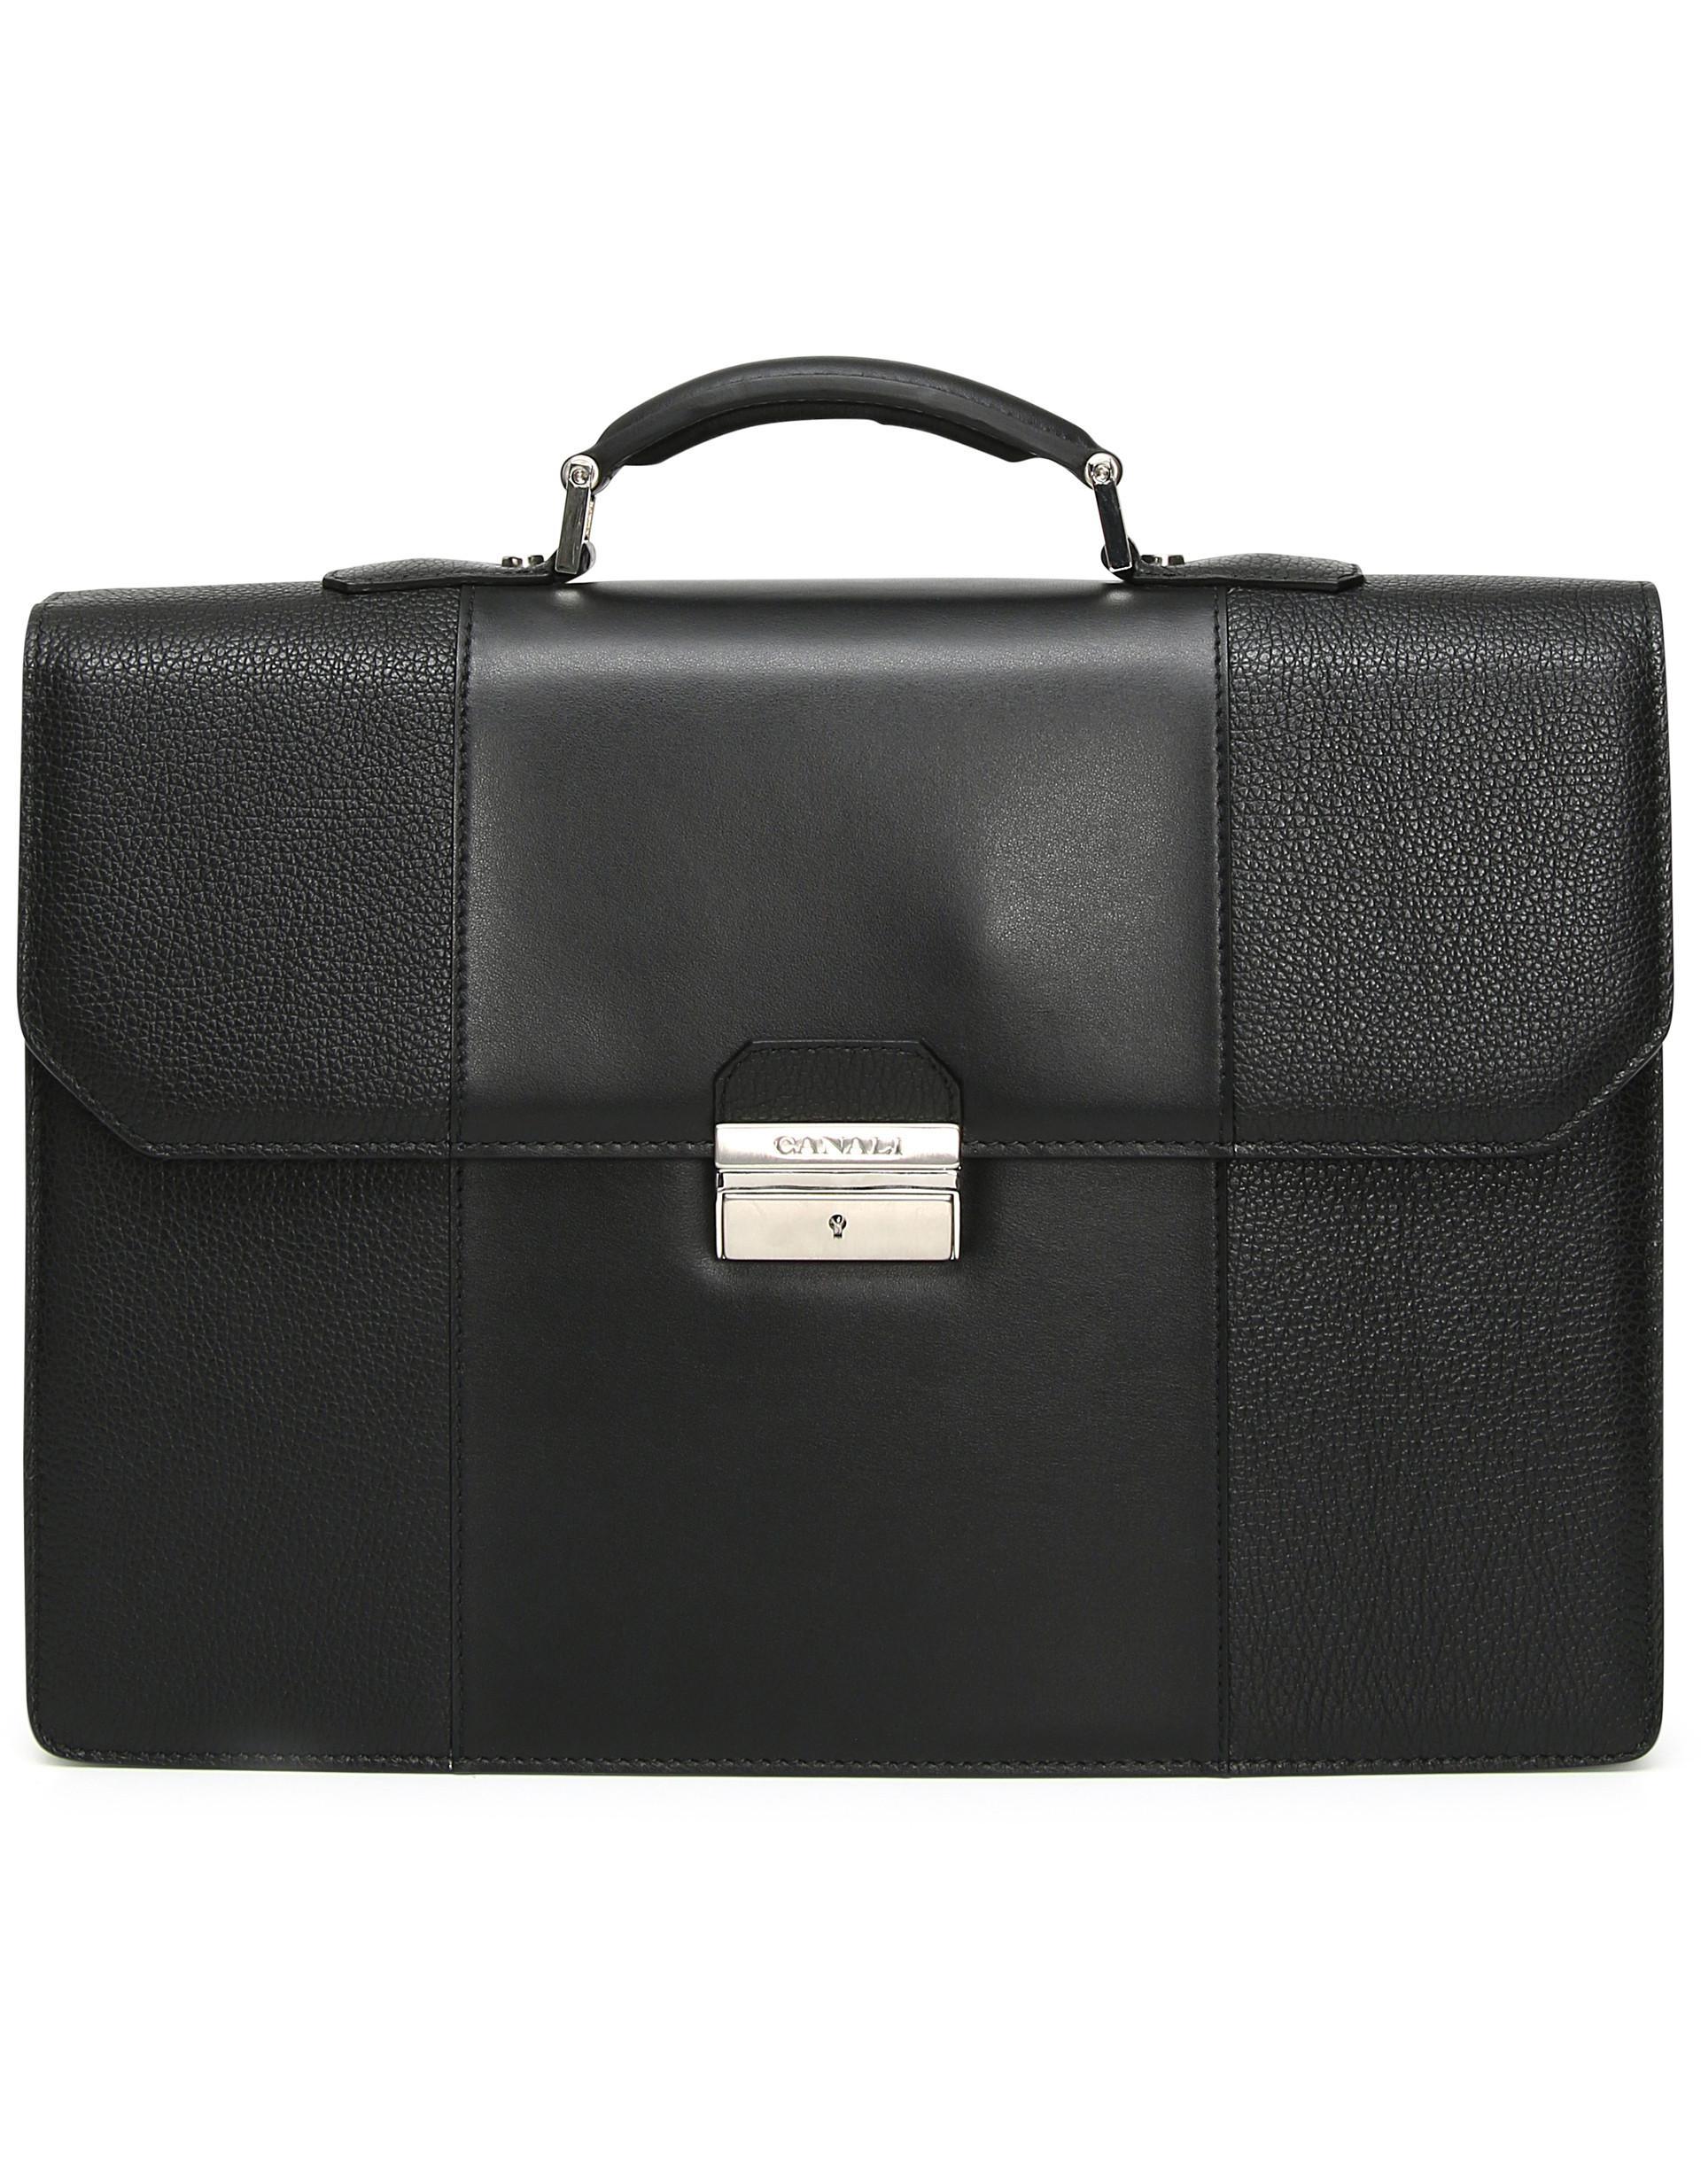 16ec7f15e860 Lyst - Canali Black Tumbled Calfskin Leather Briefcase in Black for Men